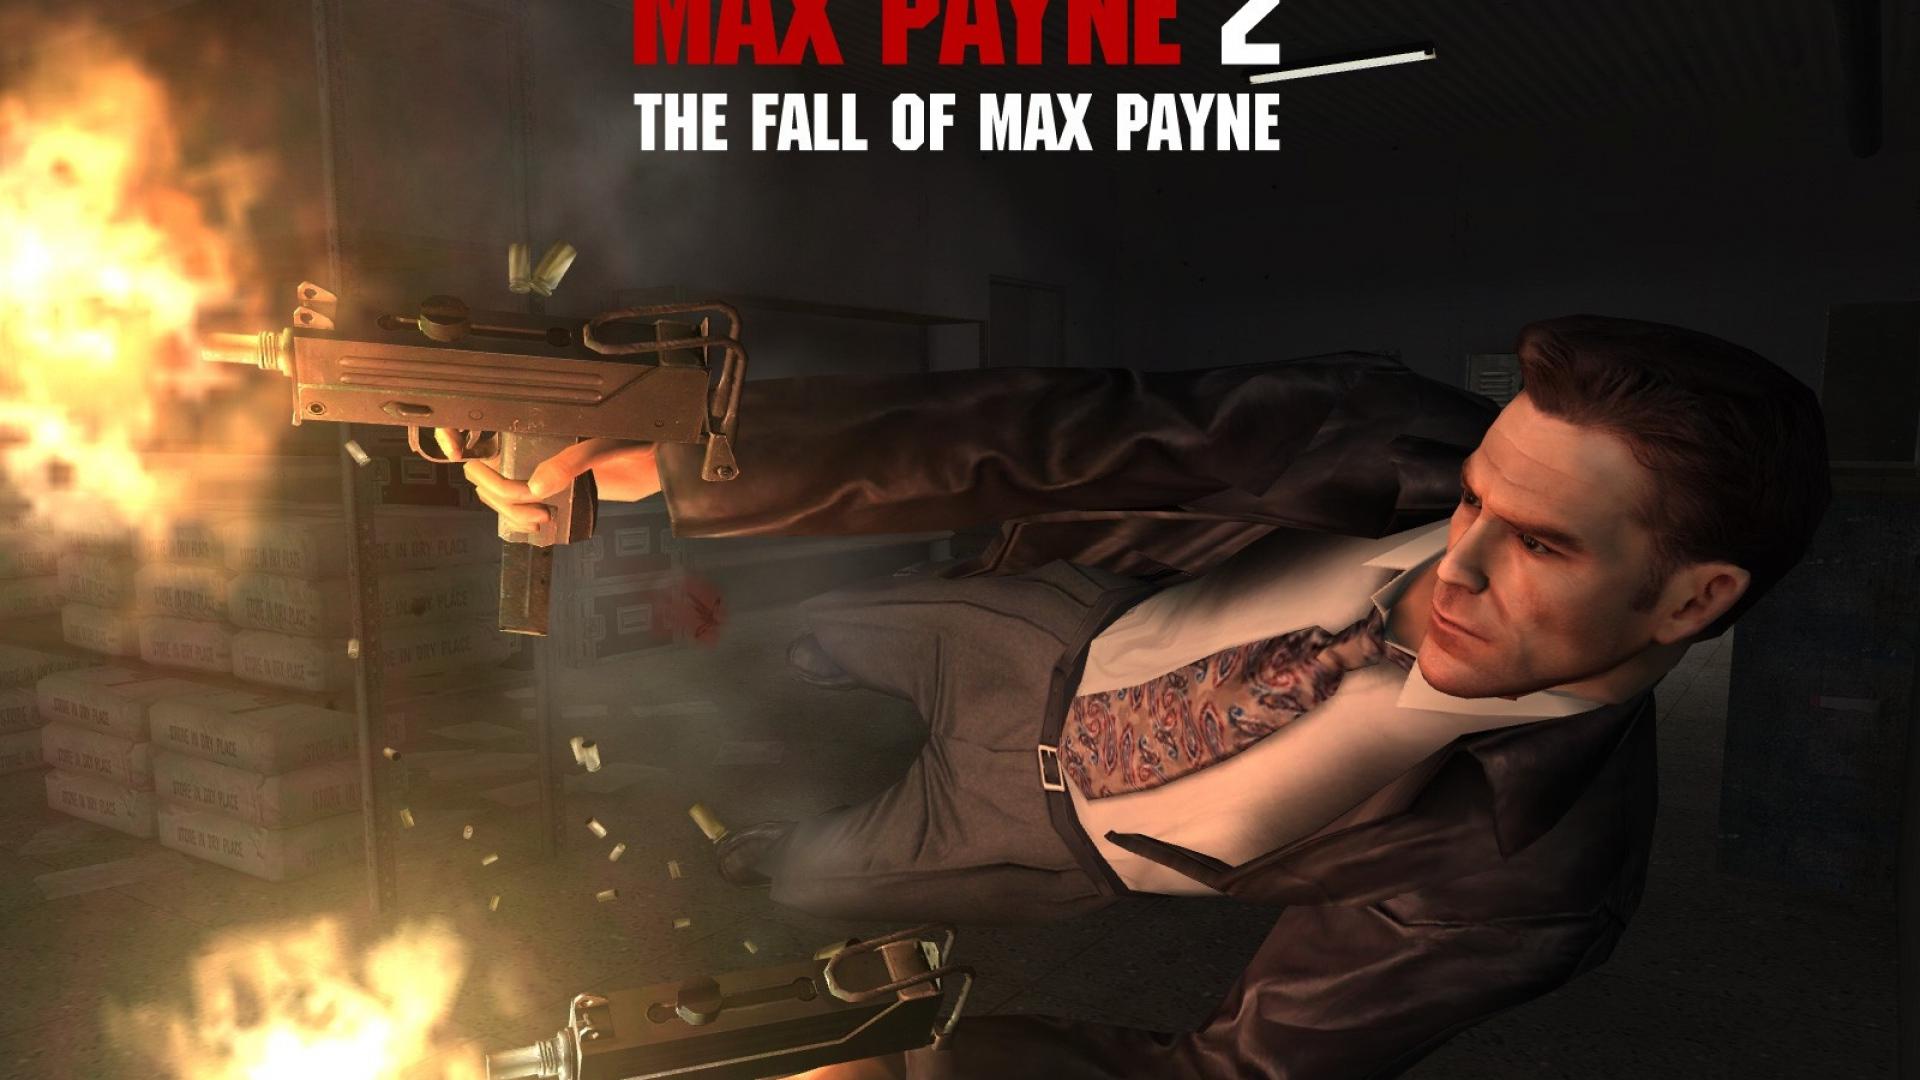 Must see Wallpaper Movie Max Payne - max_payne_2_max_payne_the_fall_of_max_payne_jump_uzi_fire_gun_16132_1920x1080  Collection_955617.jpg